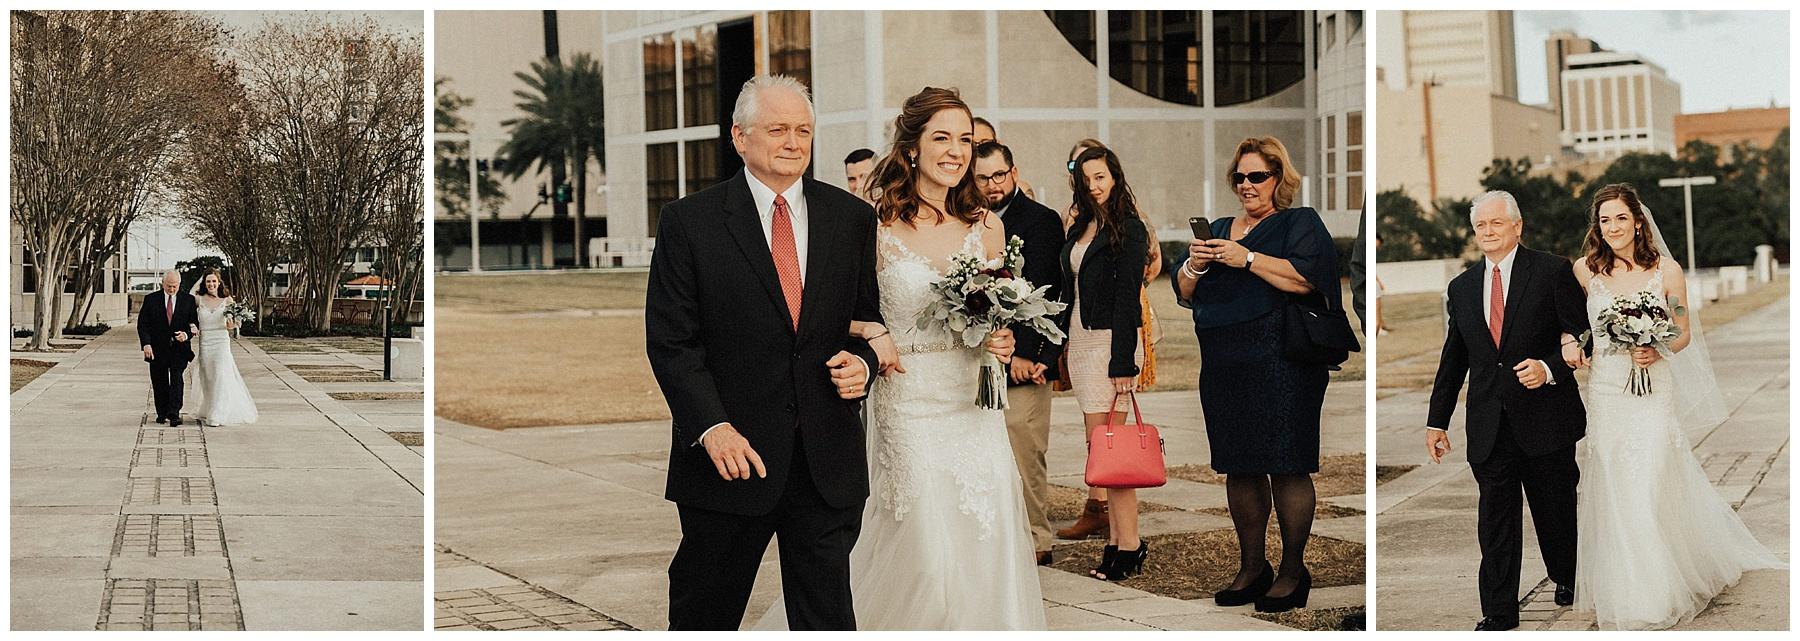 Kylie Garden Wedding Tampa Wedding Photographer-64.jpg